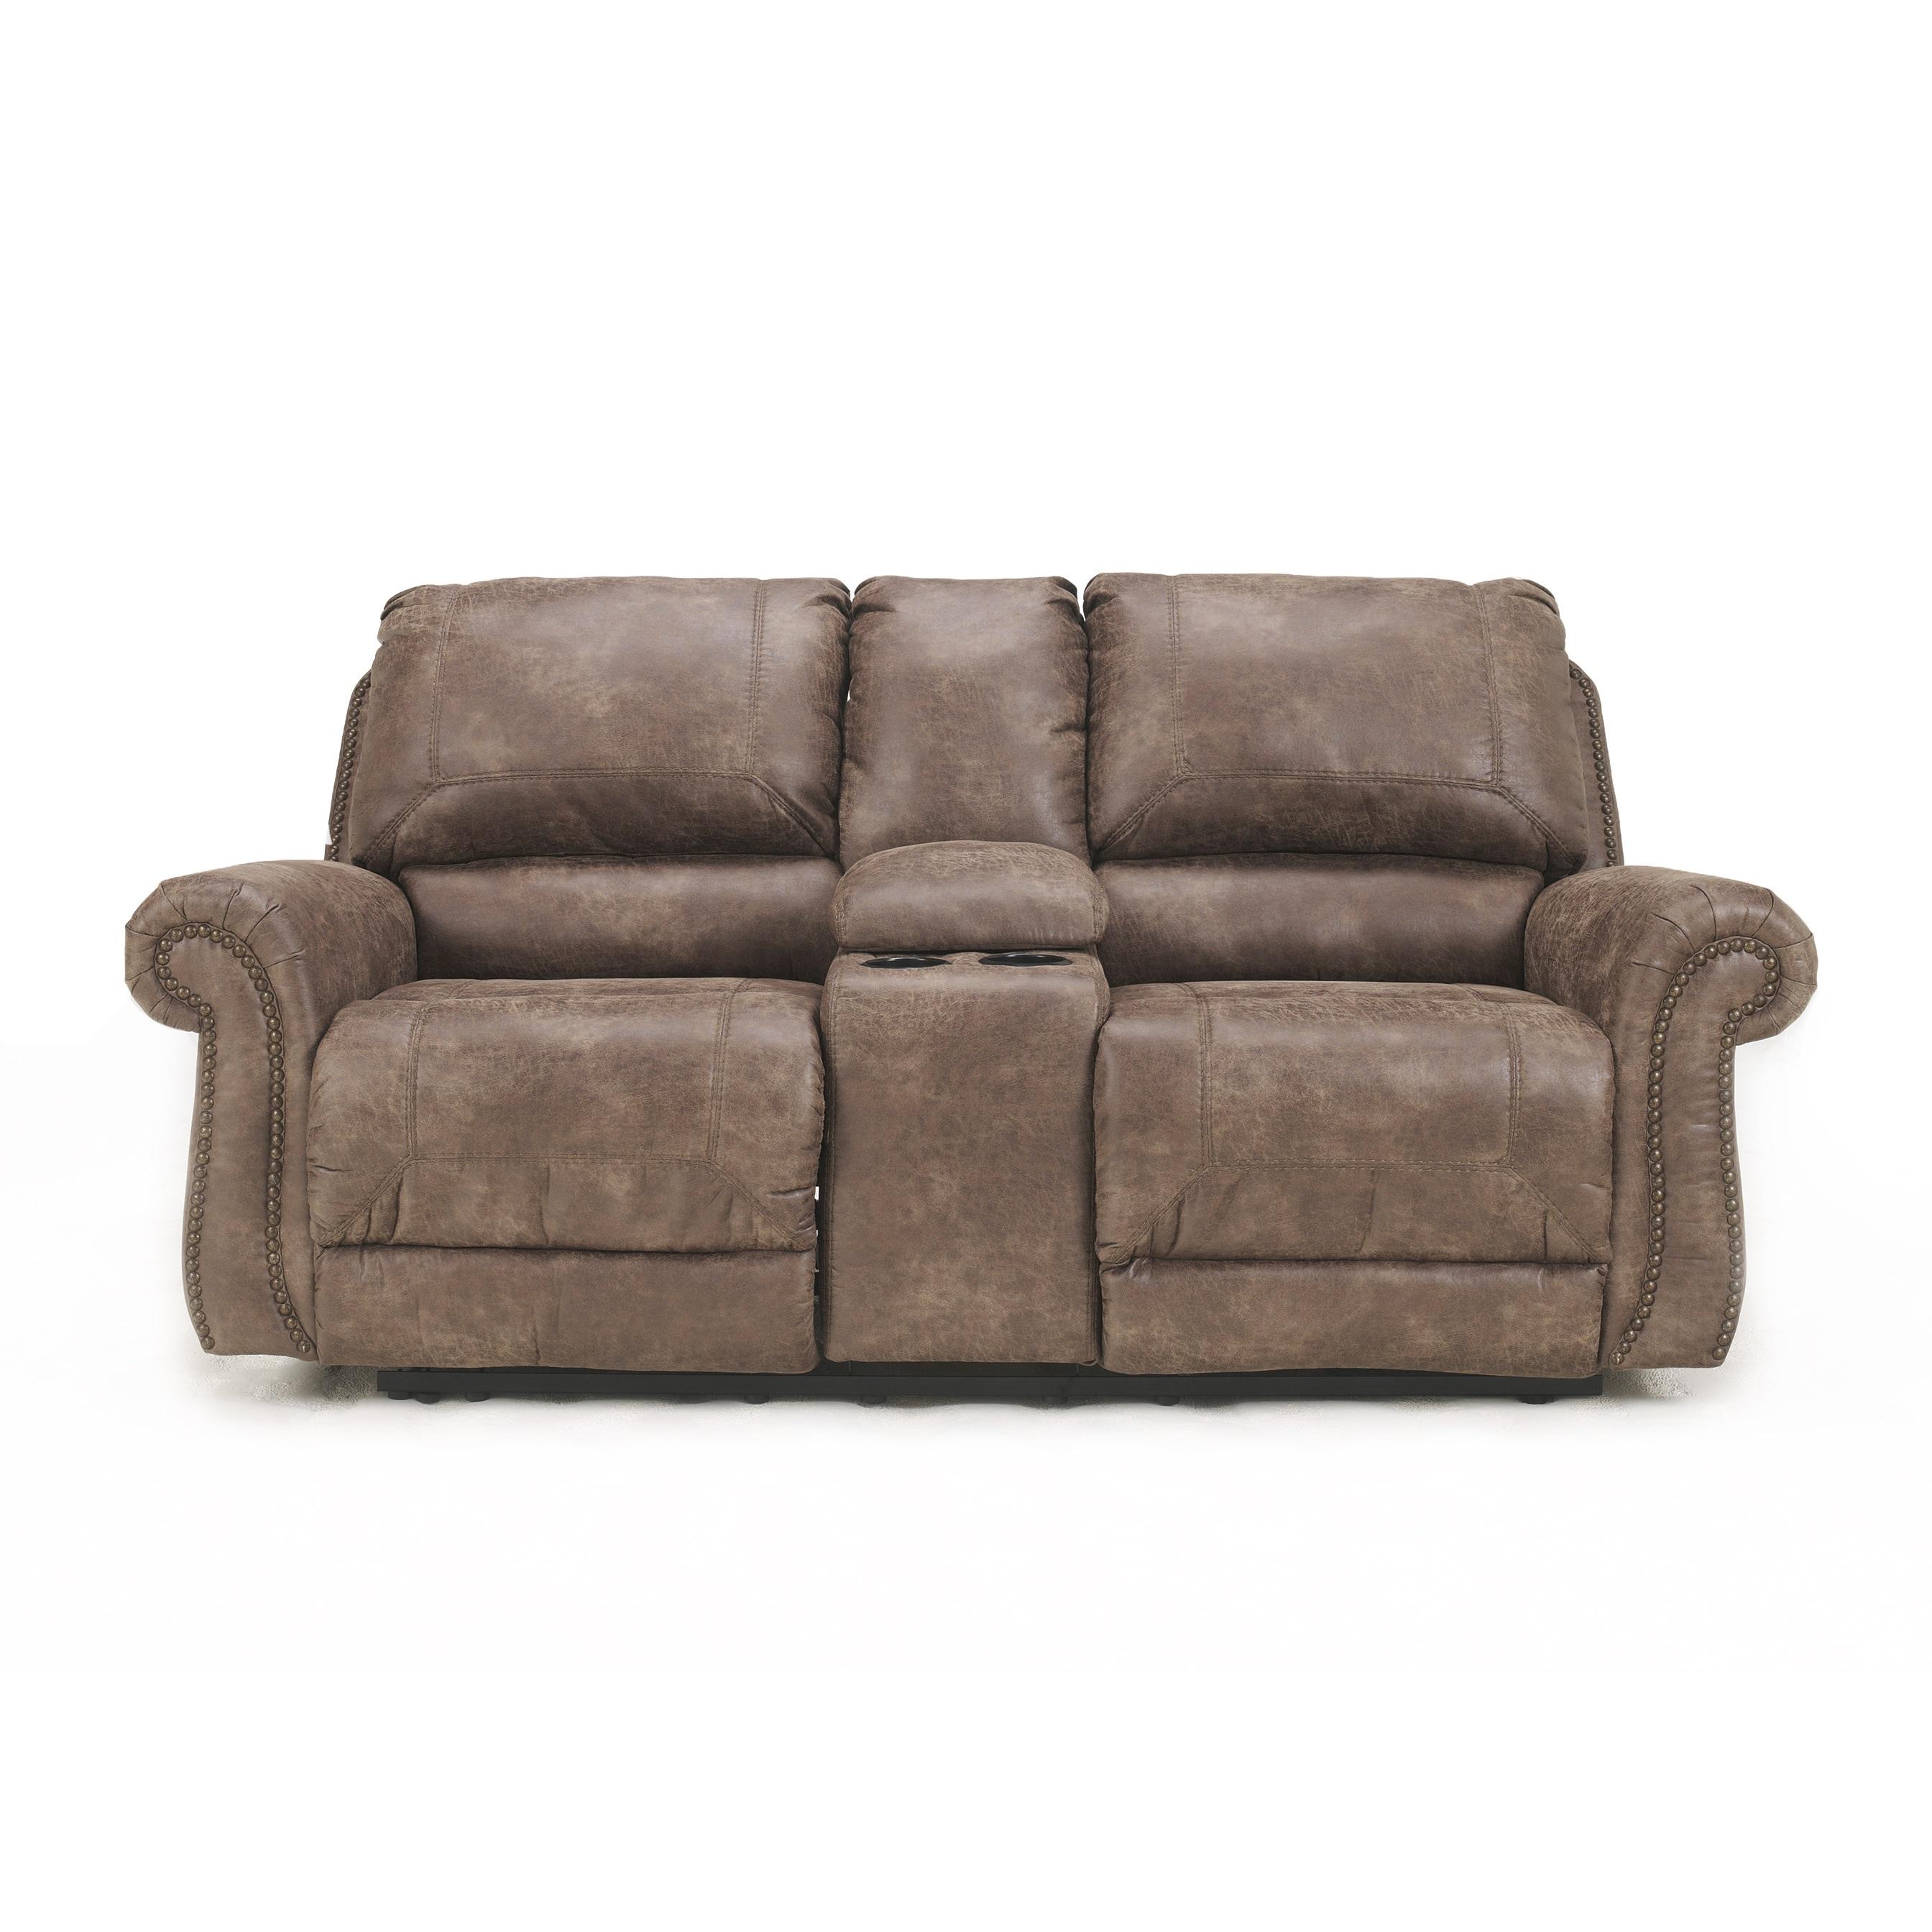 Ashley Oberson Gunsmoke Brown Dual-reclining Loveseat (Bo...